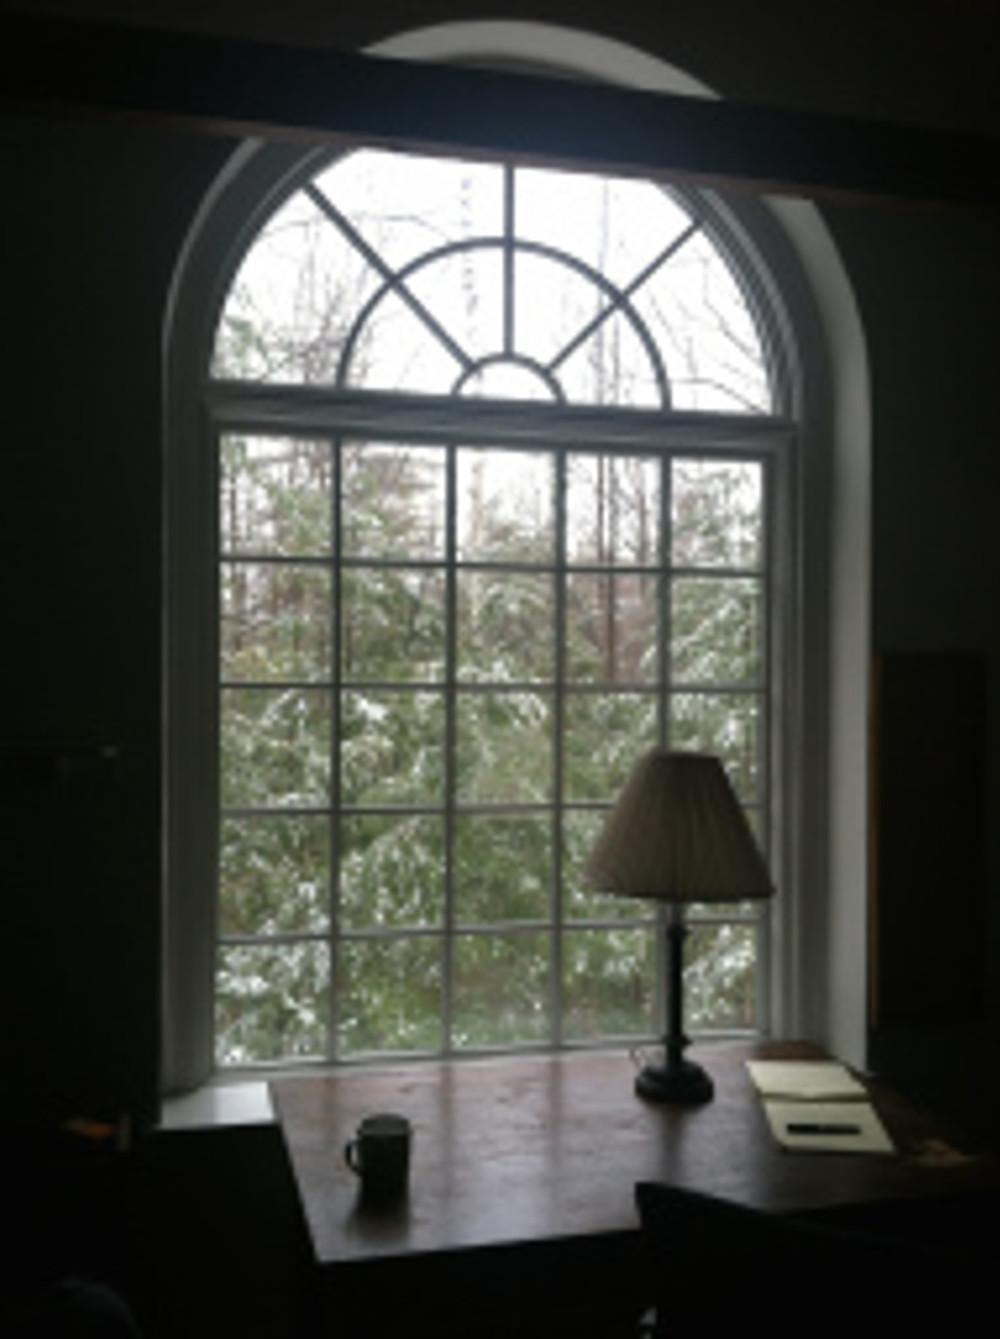 macdowell desk view